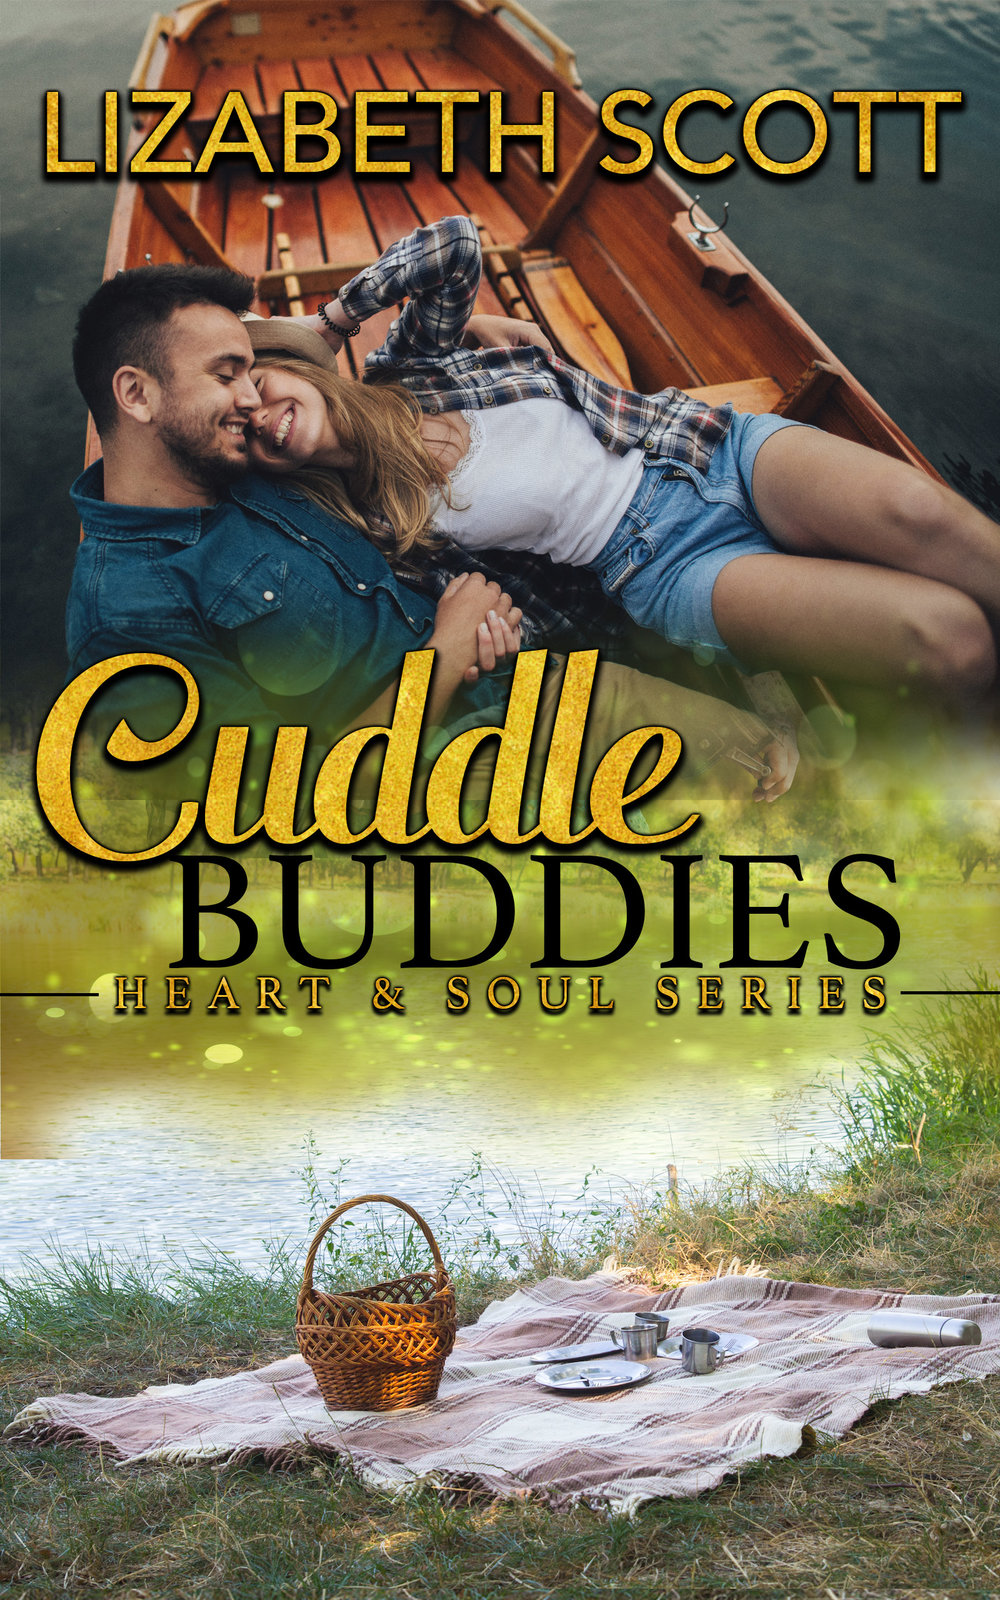 cuddle buddies.jpg